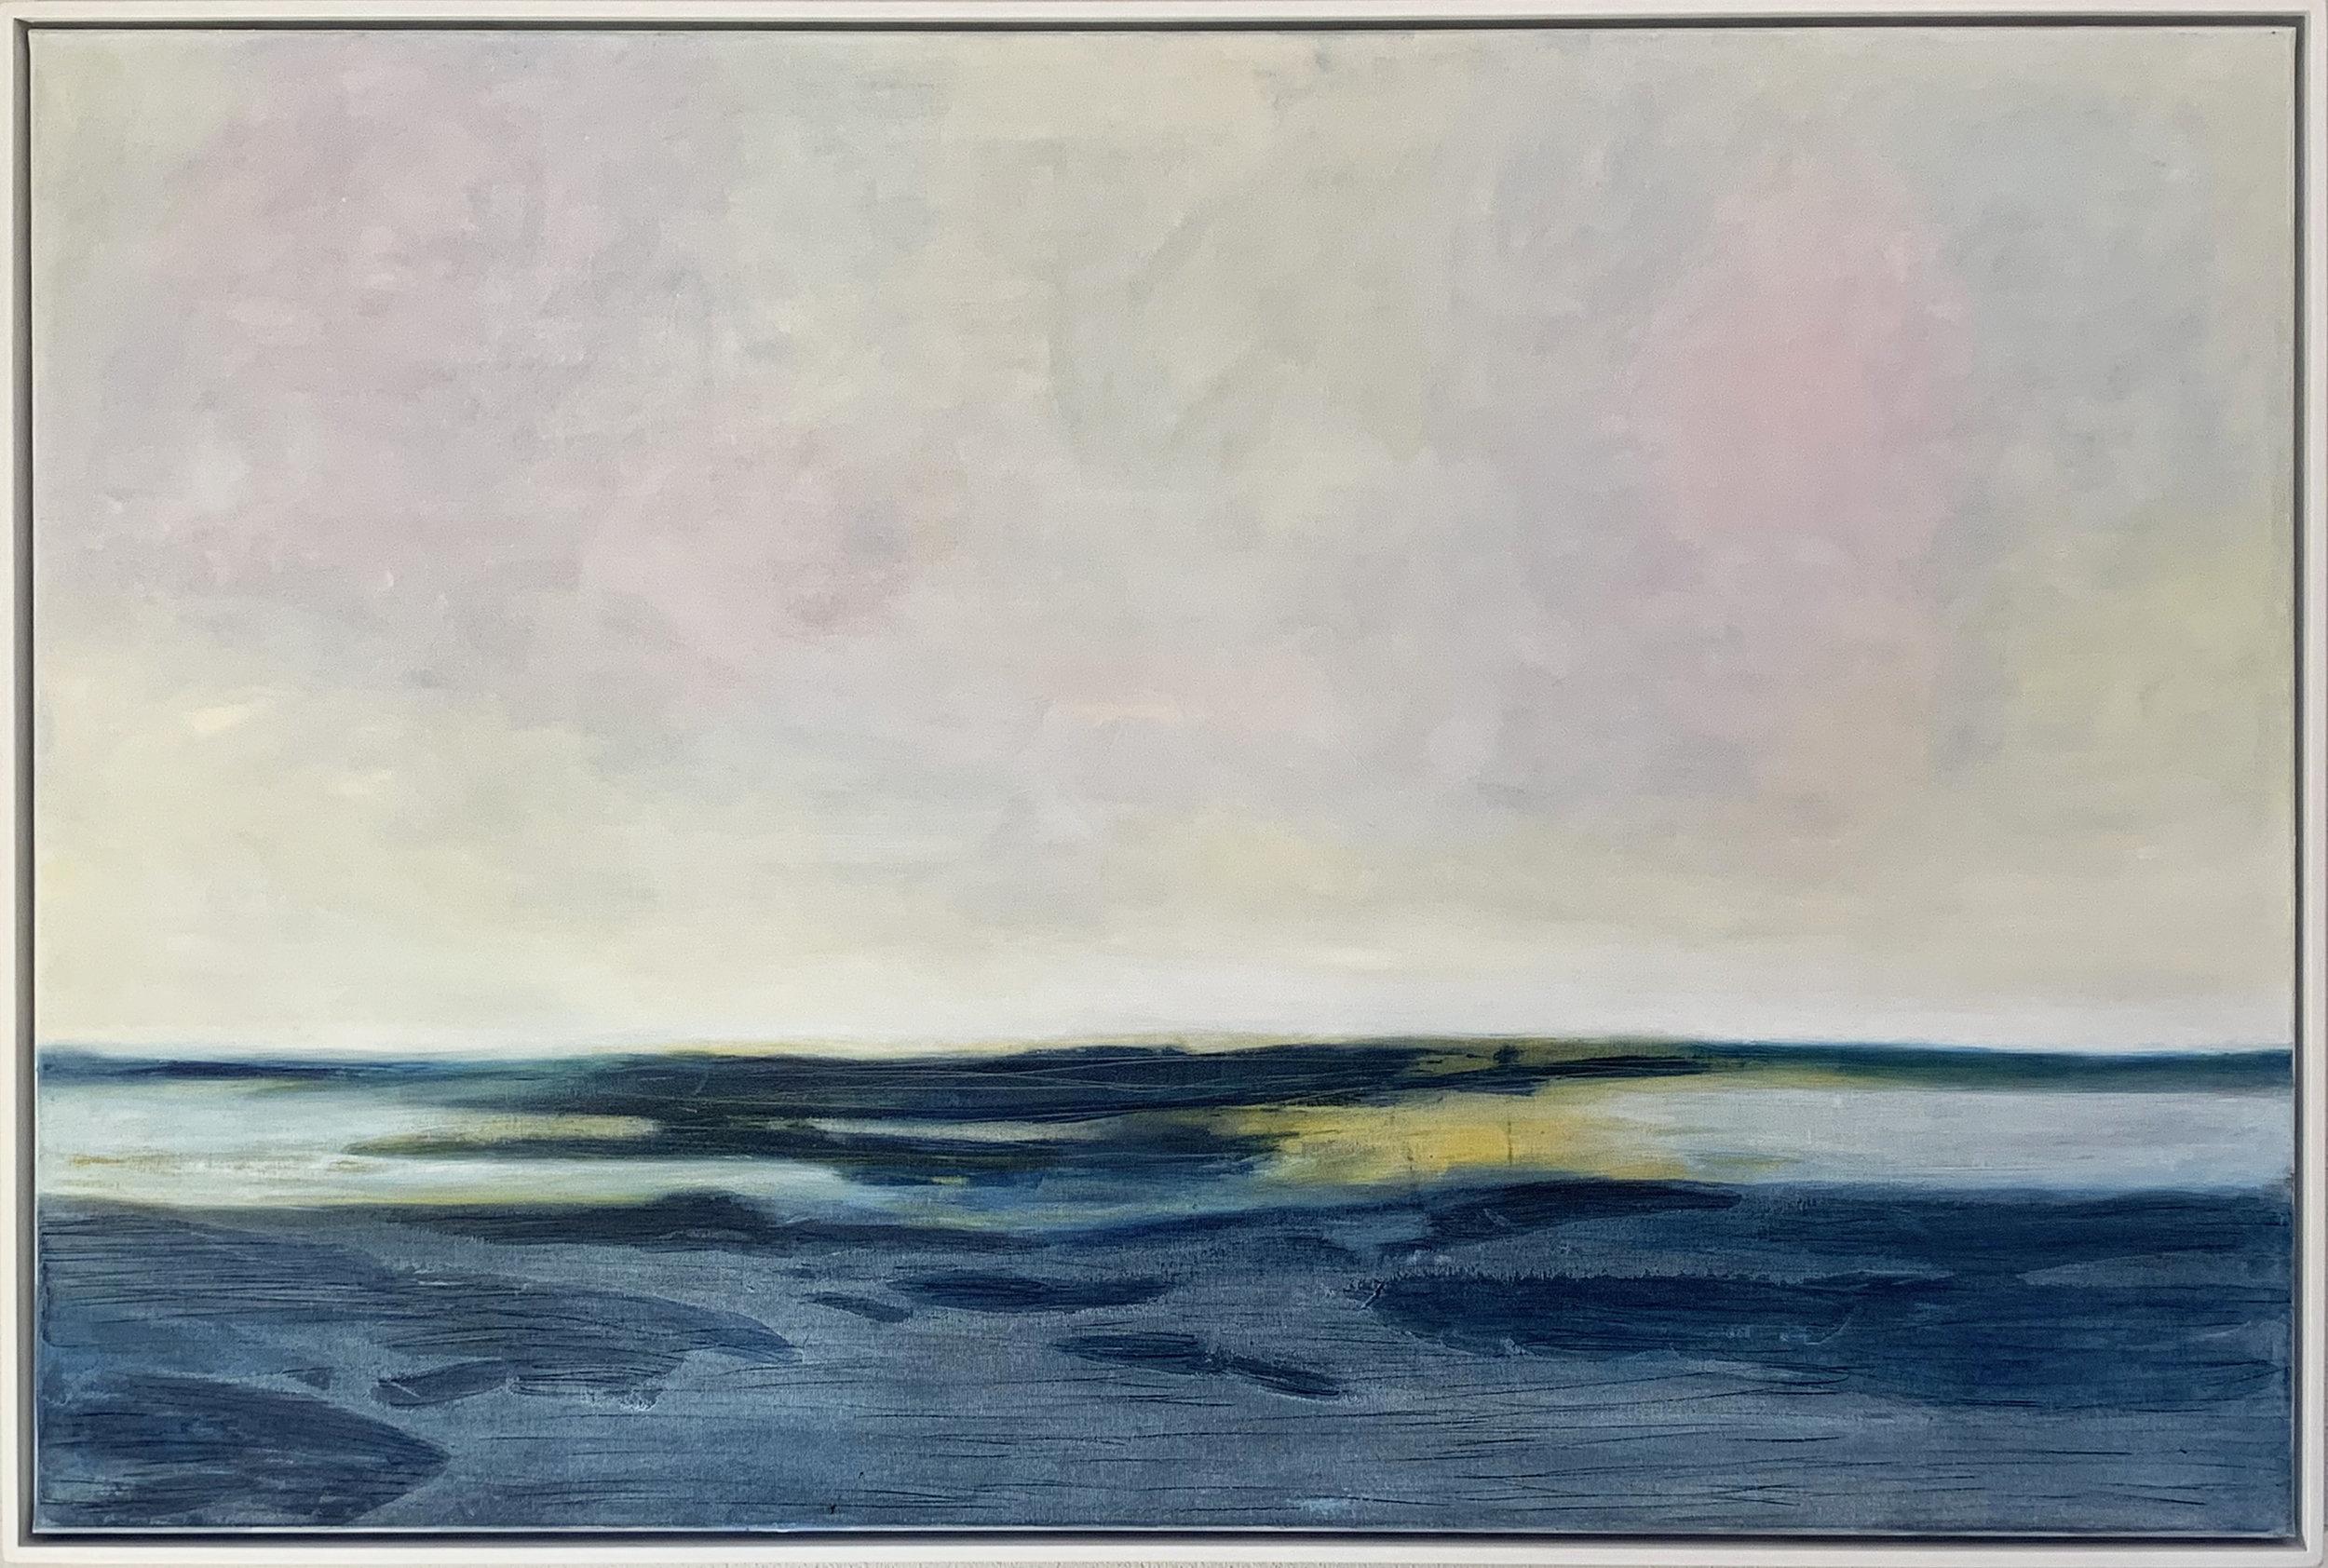 SUMMER SEASCAPE oils on canvas 150cm x 100cm For Sale